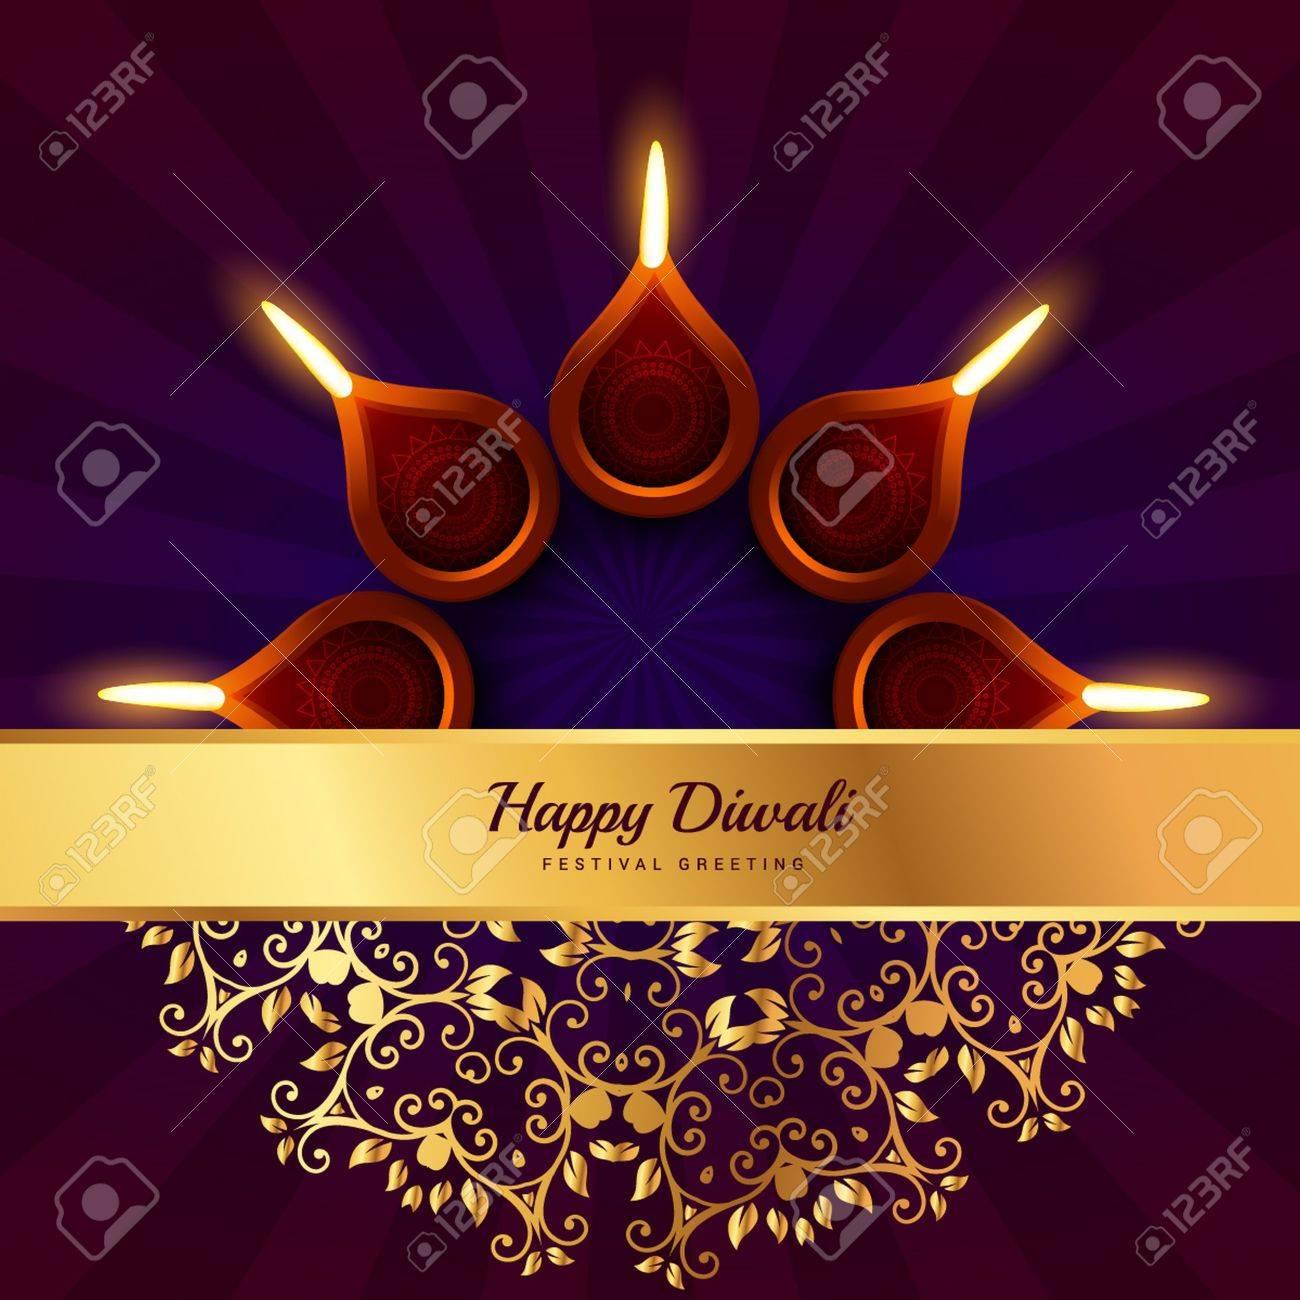 Happy diwali greeting design background royalty free cliparts happy diwali greeting design background stock vector 50771400 m4hsunfo